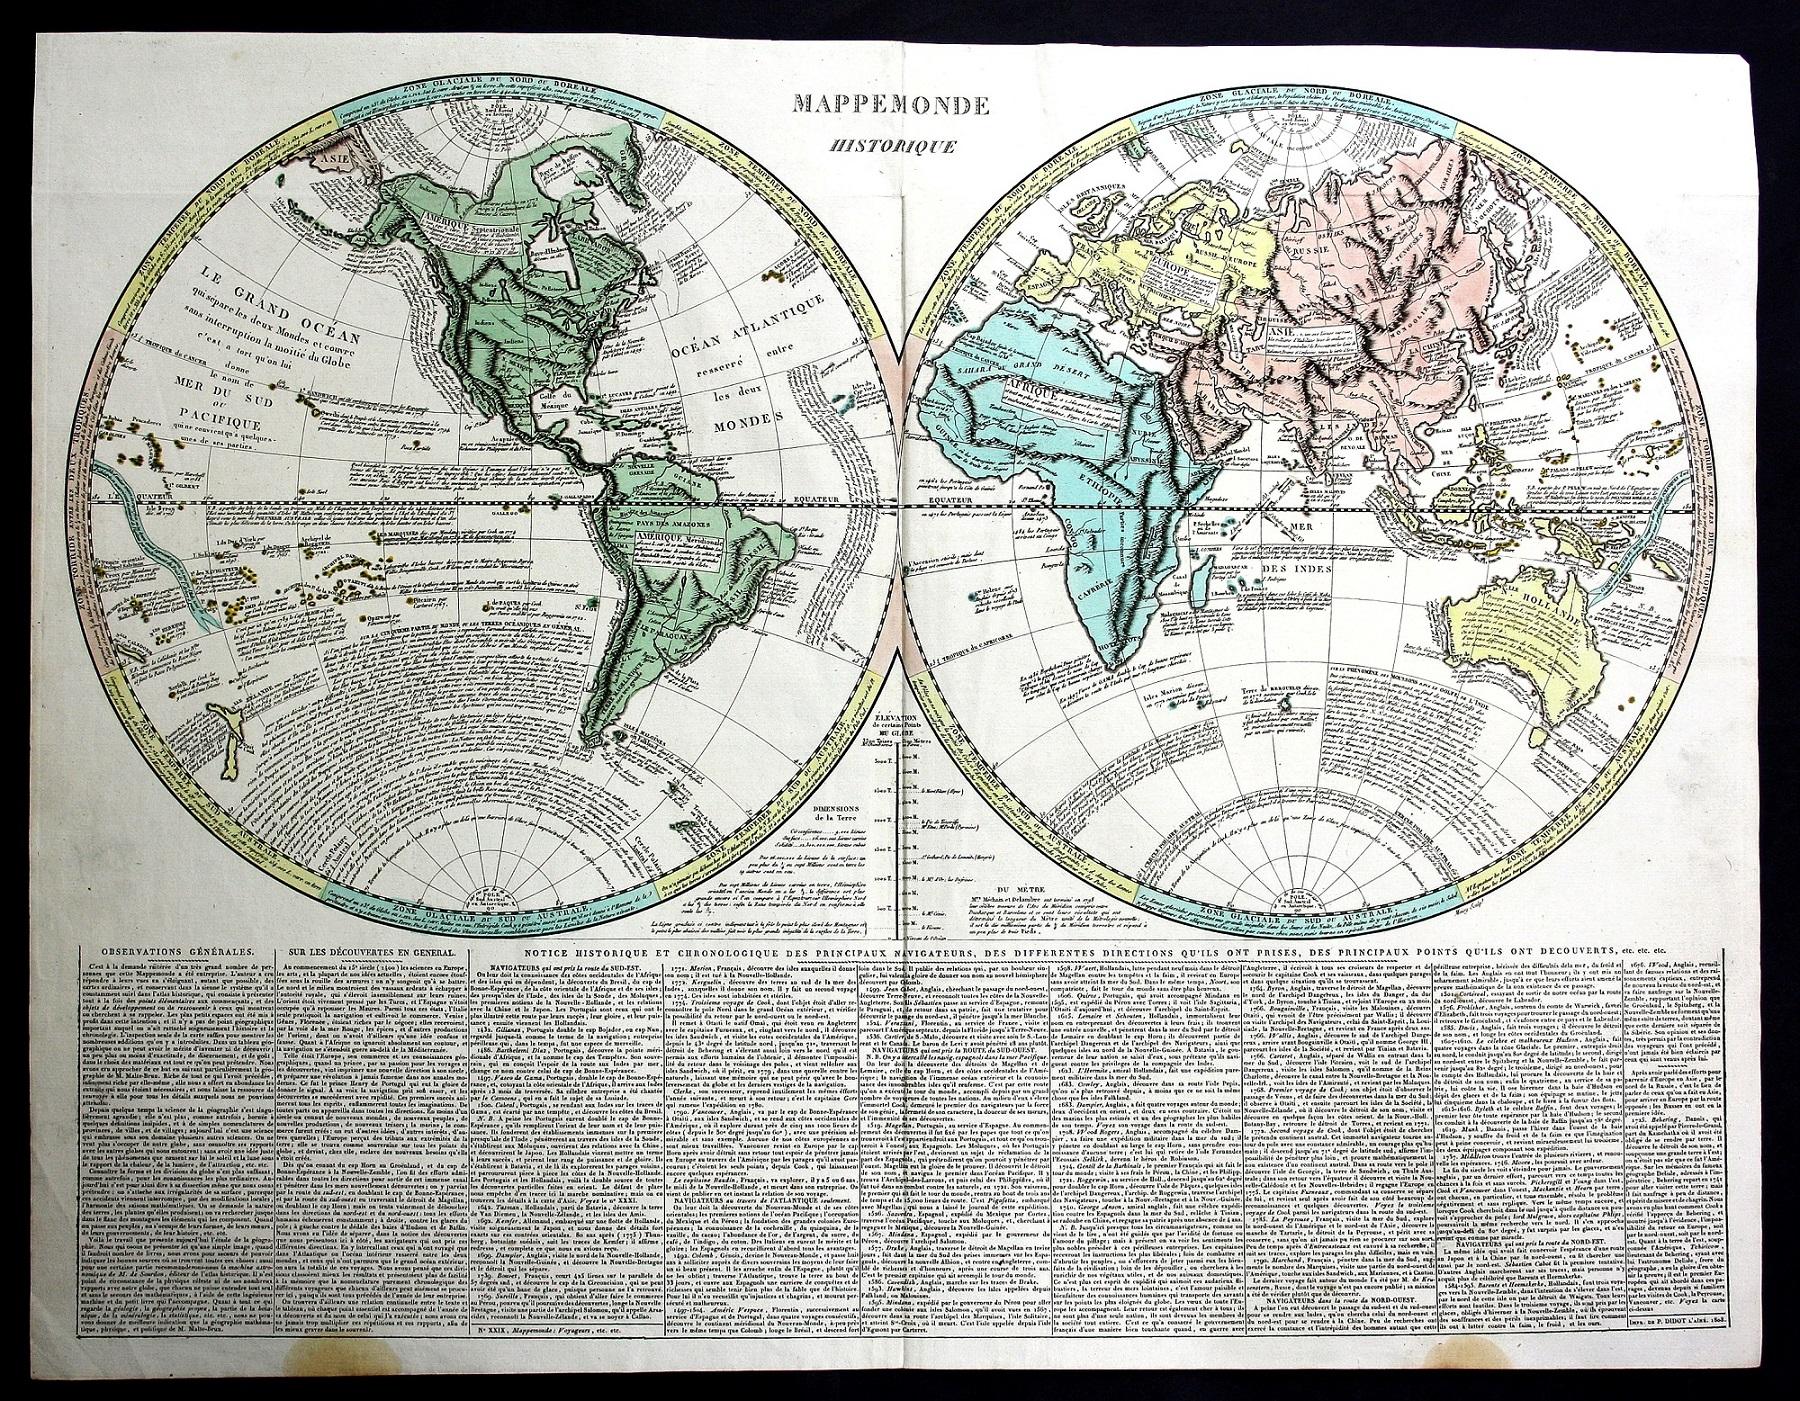 Karte Europa Asien.Mappemonde Historique